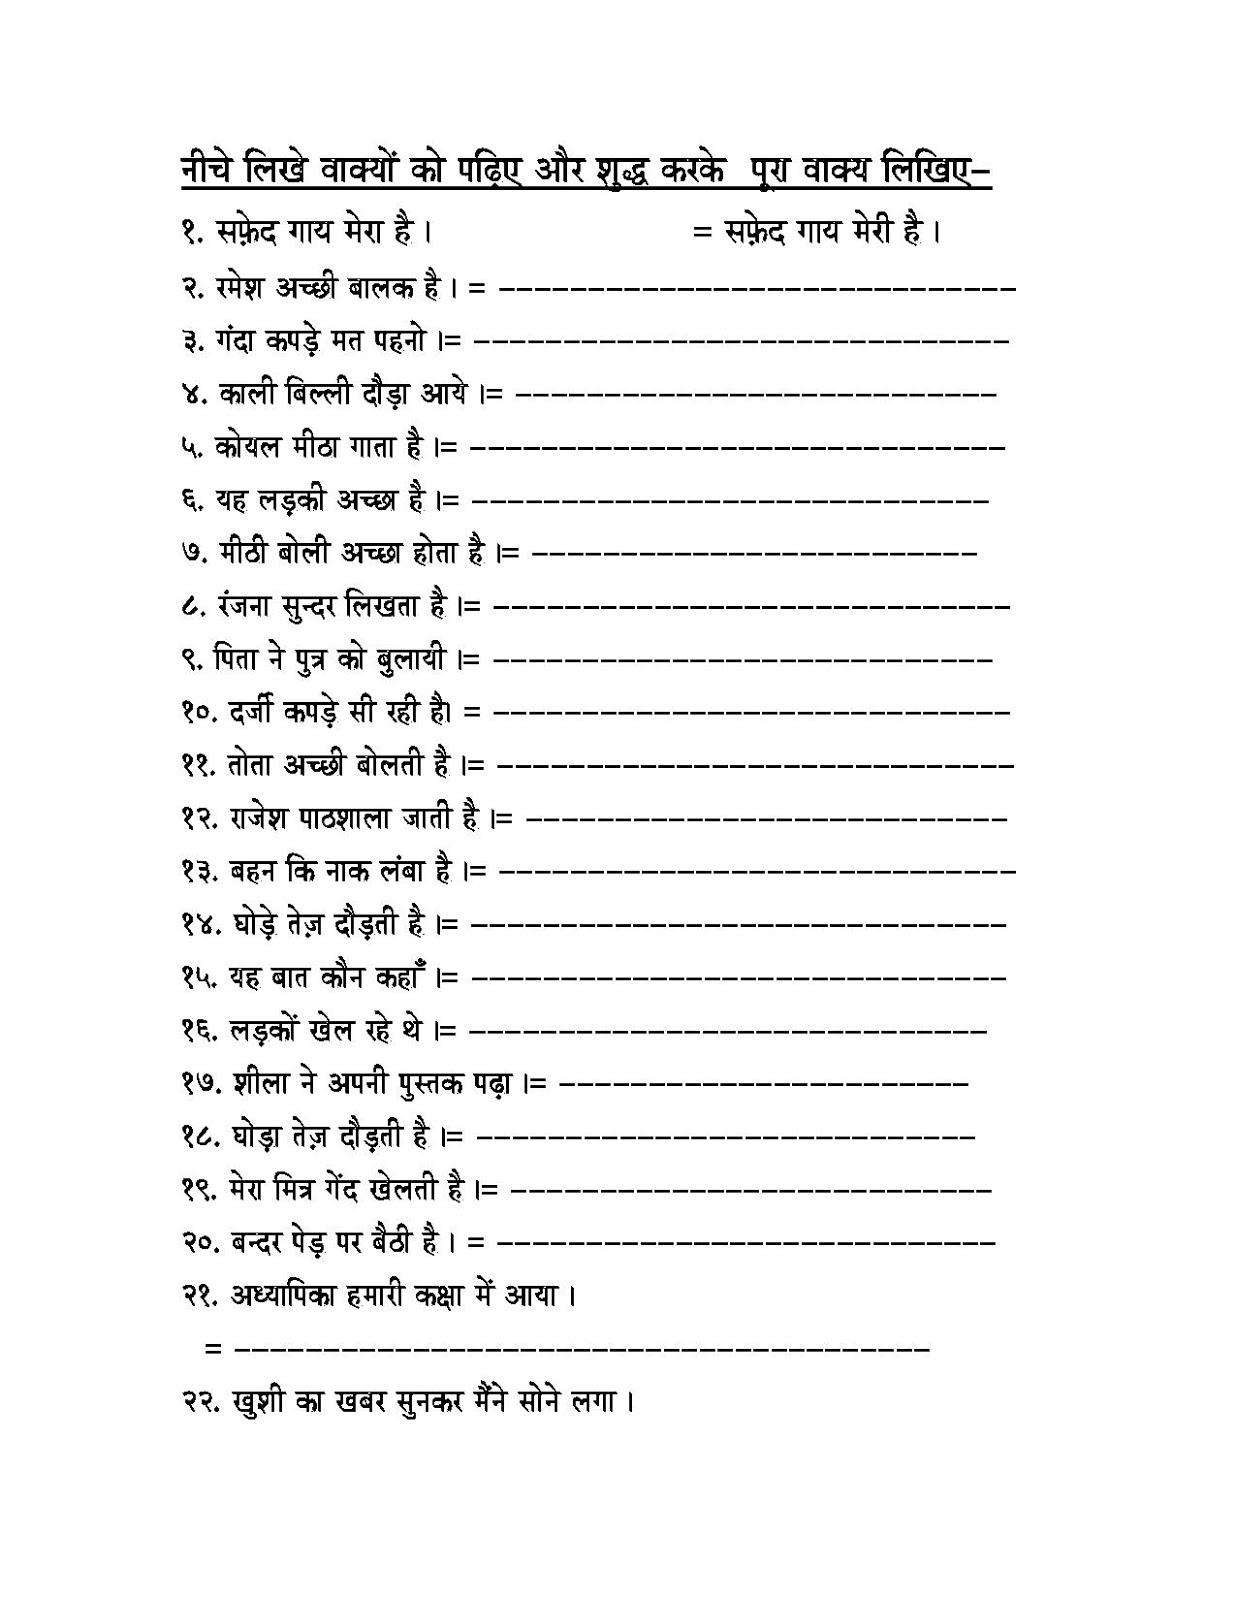 hight resolution of 100+  Grade 1 Hindi Worksheets    Free Fun Worksheets For Kids Free Fun  Printable Hindi Worksheet